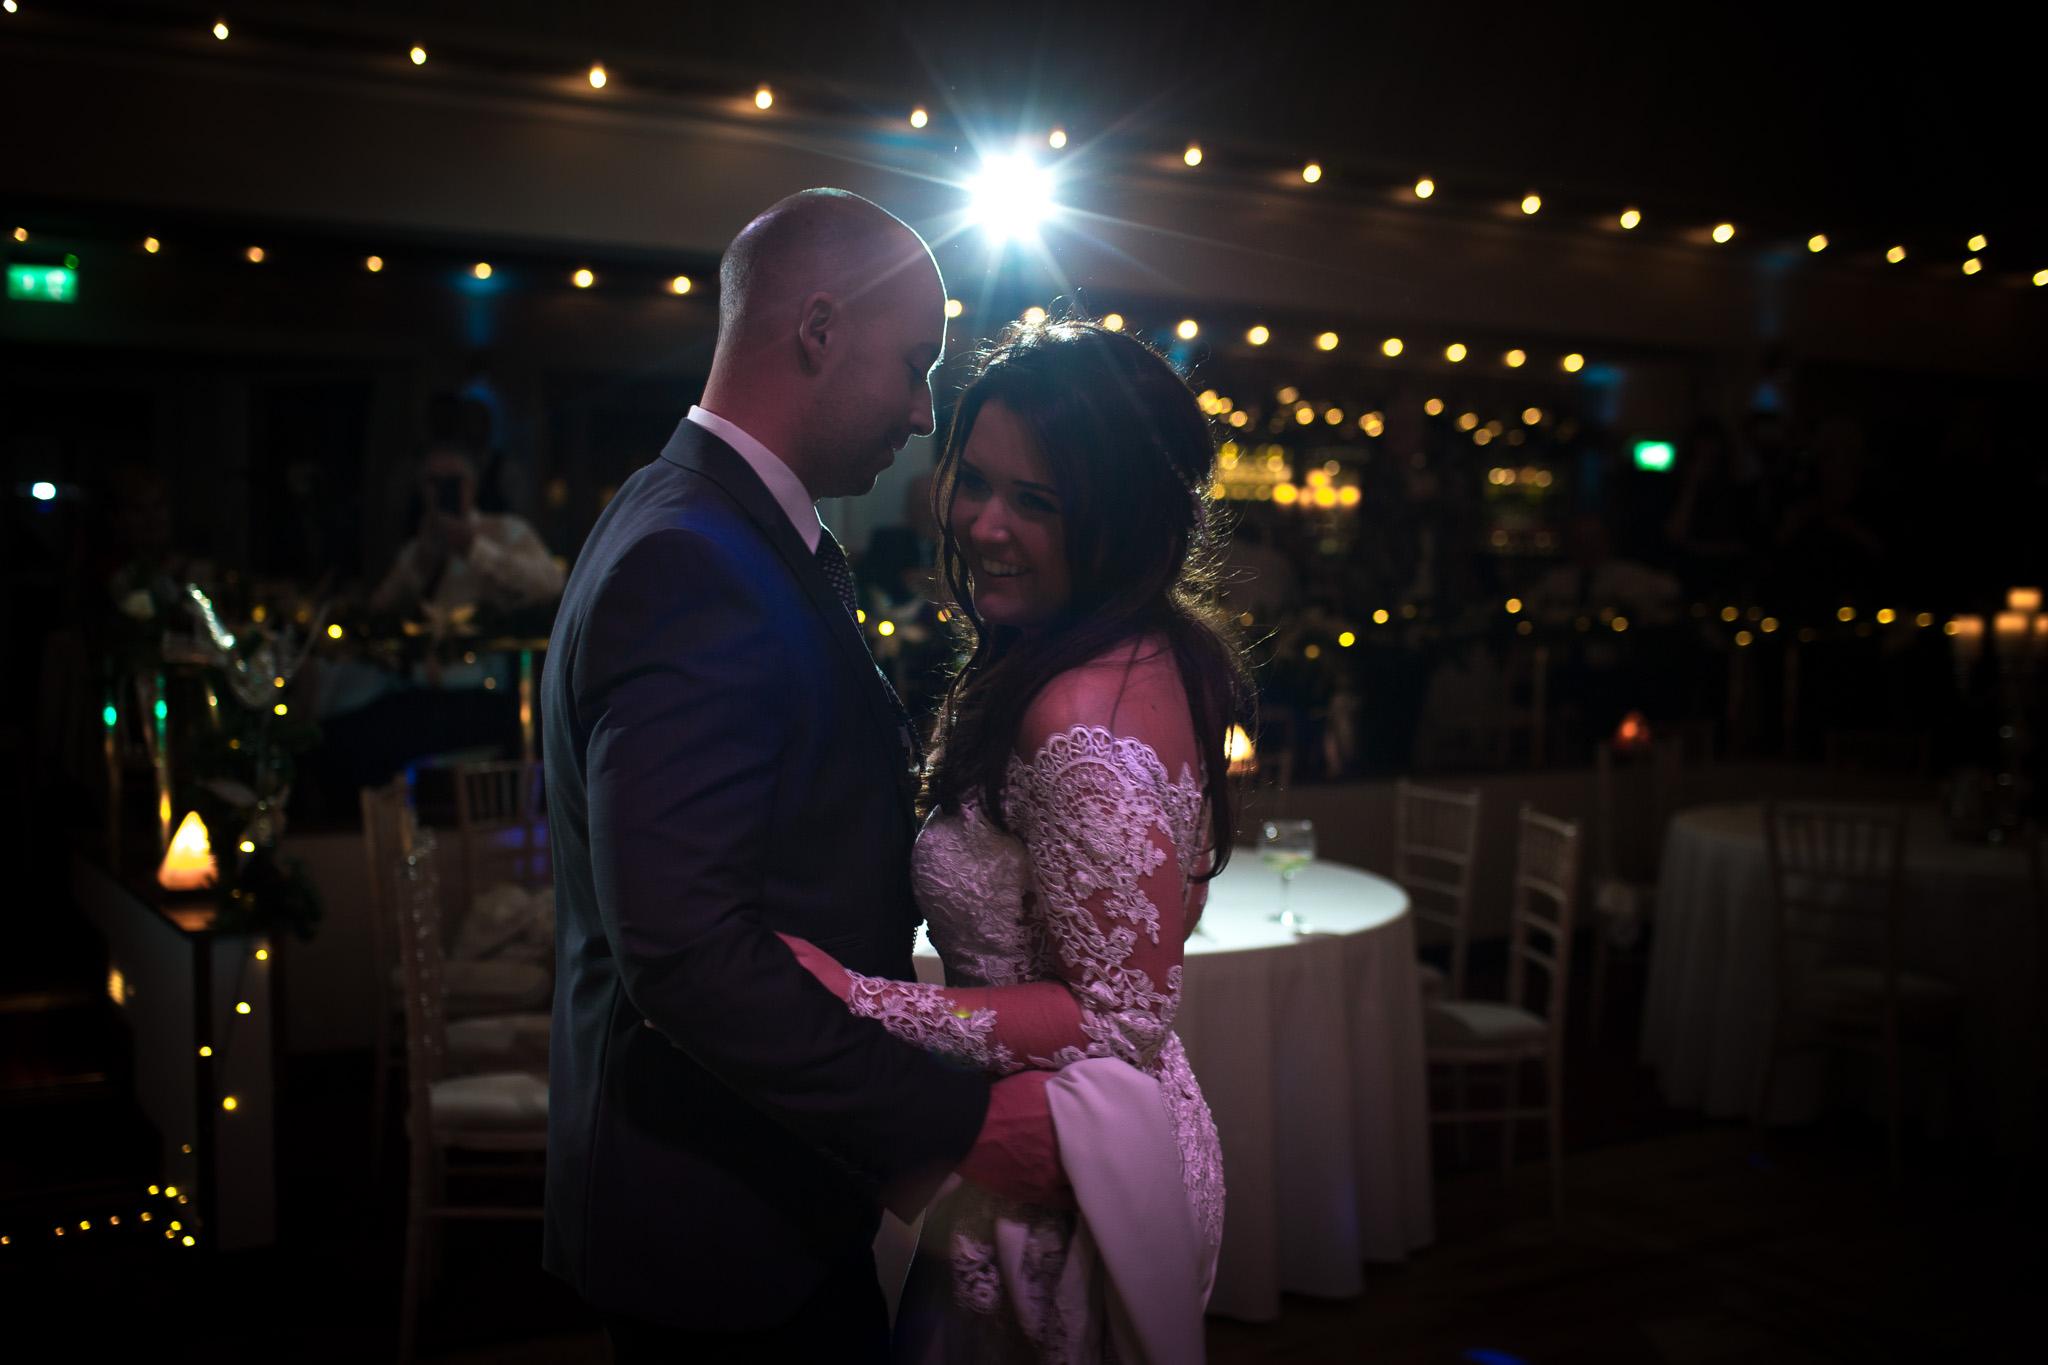 Mark_Barnes_Northern_Ireland_wedding_photographer_Harveys_Point_Donegall_Wedding_photography-Adam&Gemma-61.jpg